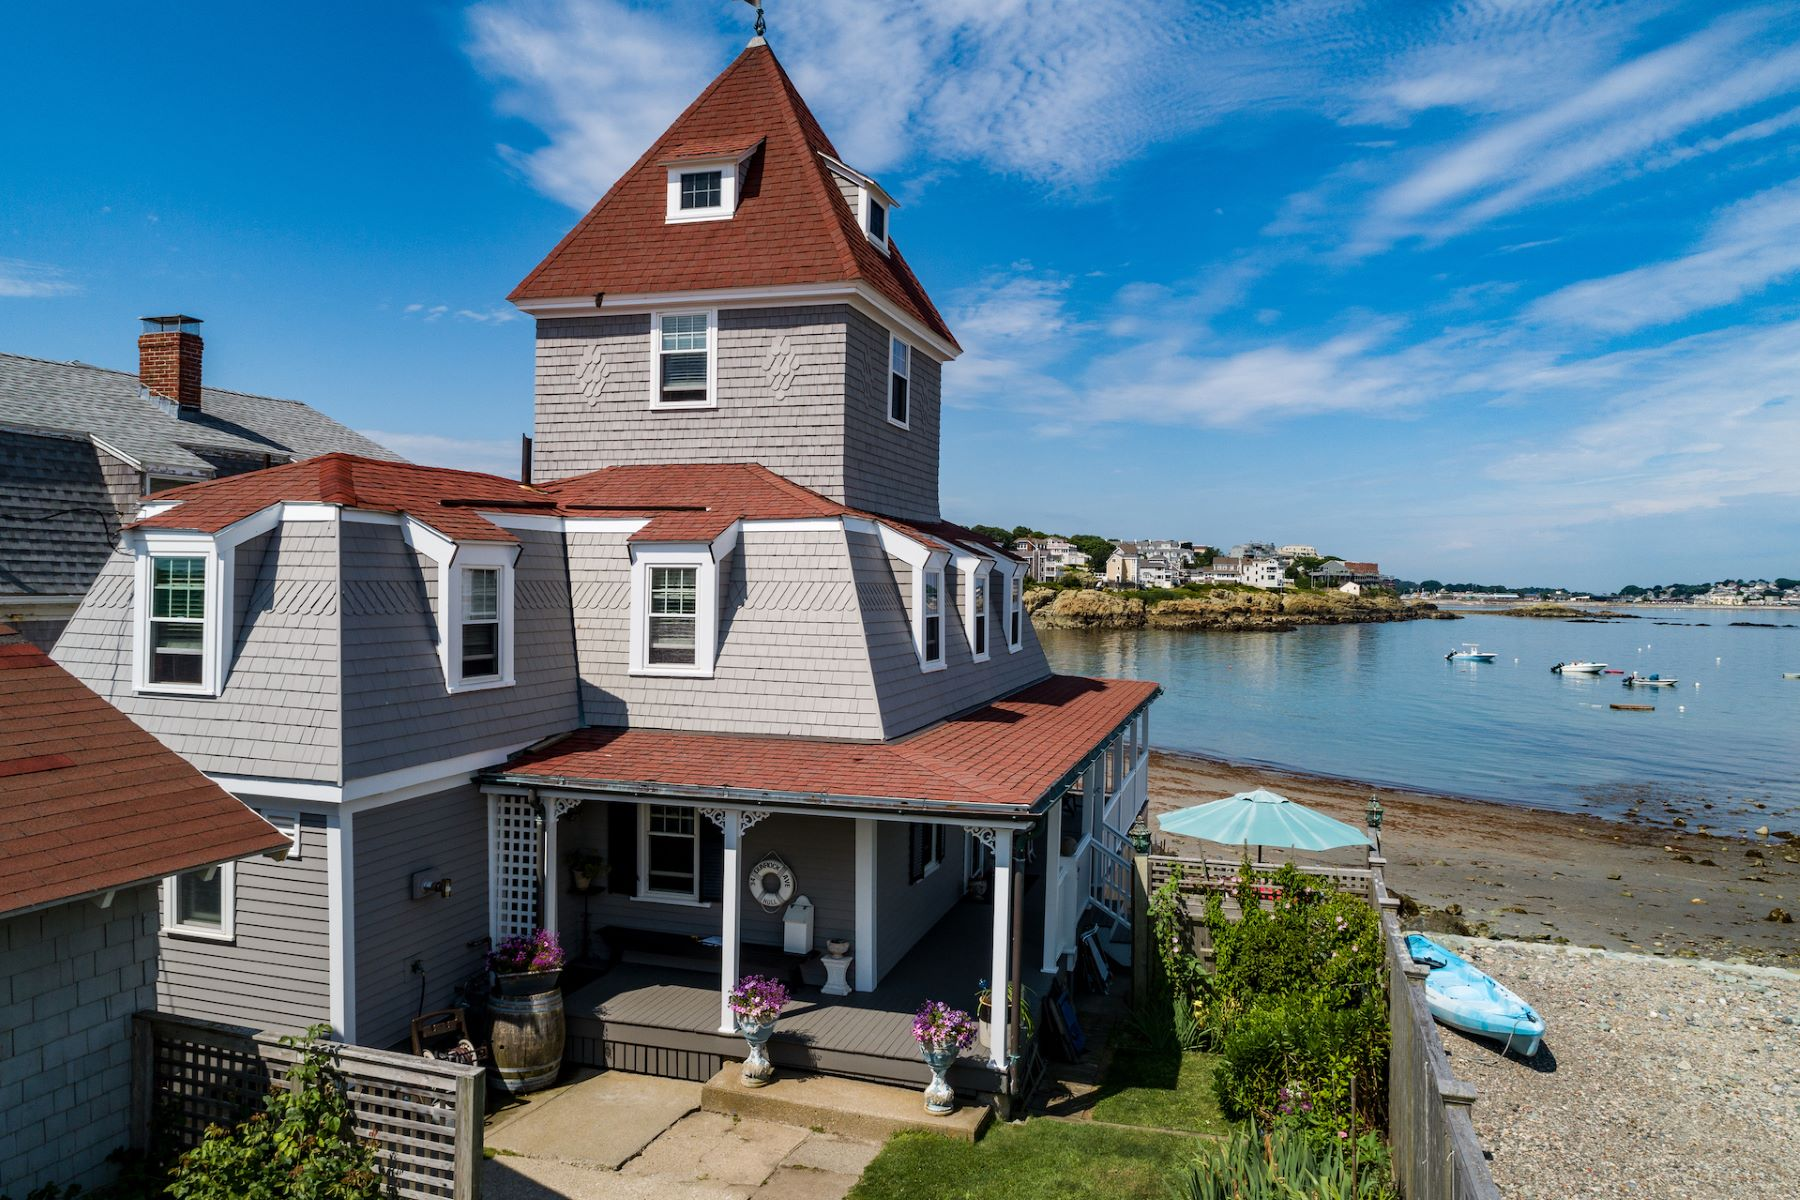 Single Family Homes for Sale at 34 Gunrock Avenue Hull, Massachusetts 02045 United States